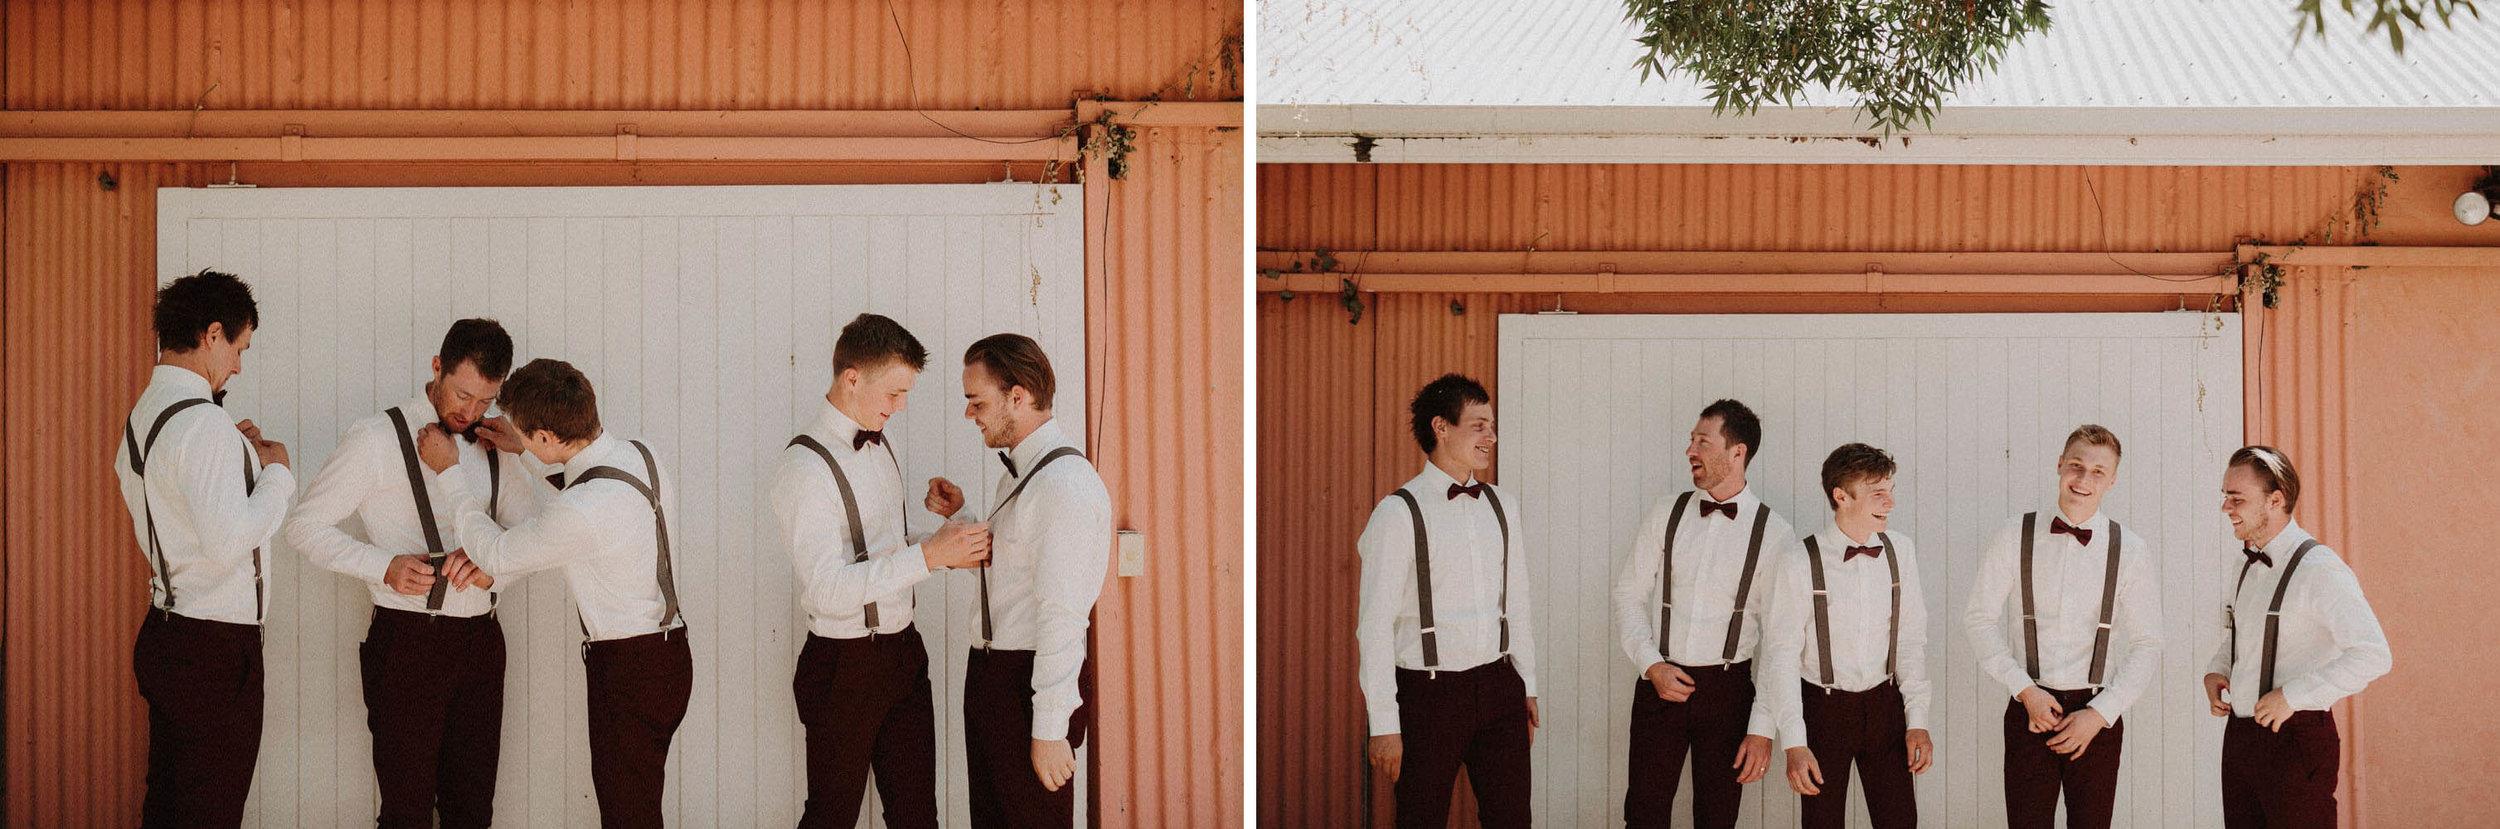 australian-wedding-photography_047(0920)2.jpg